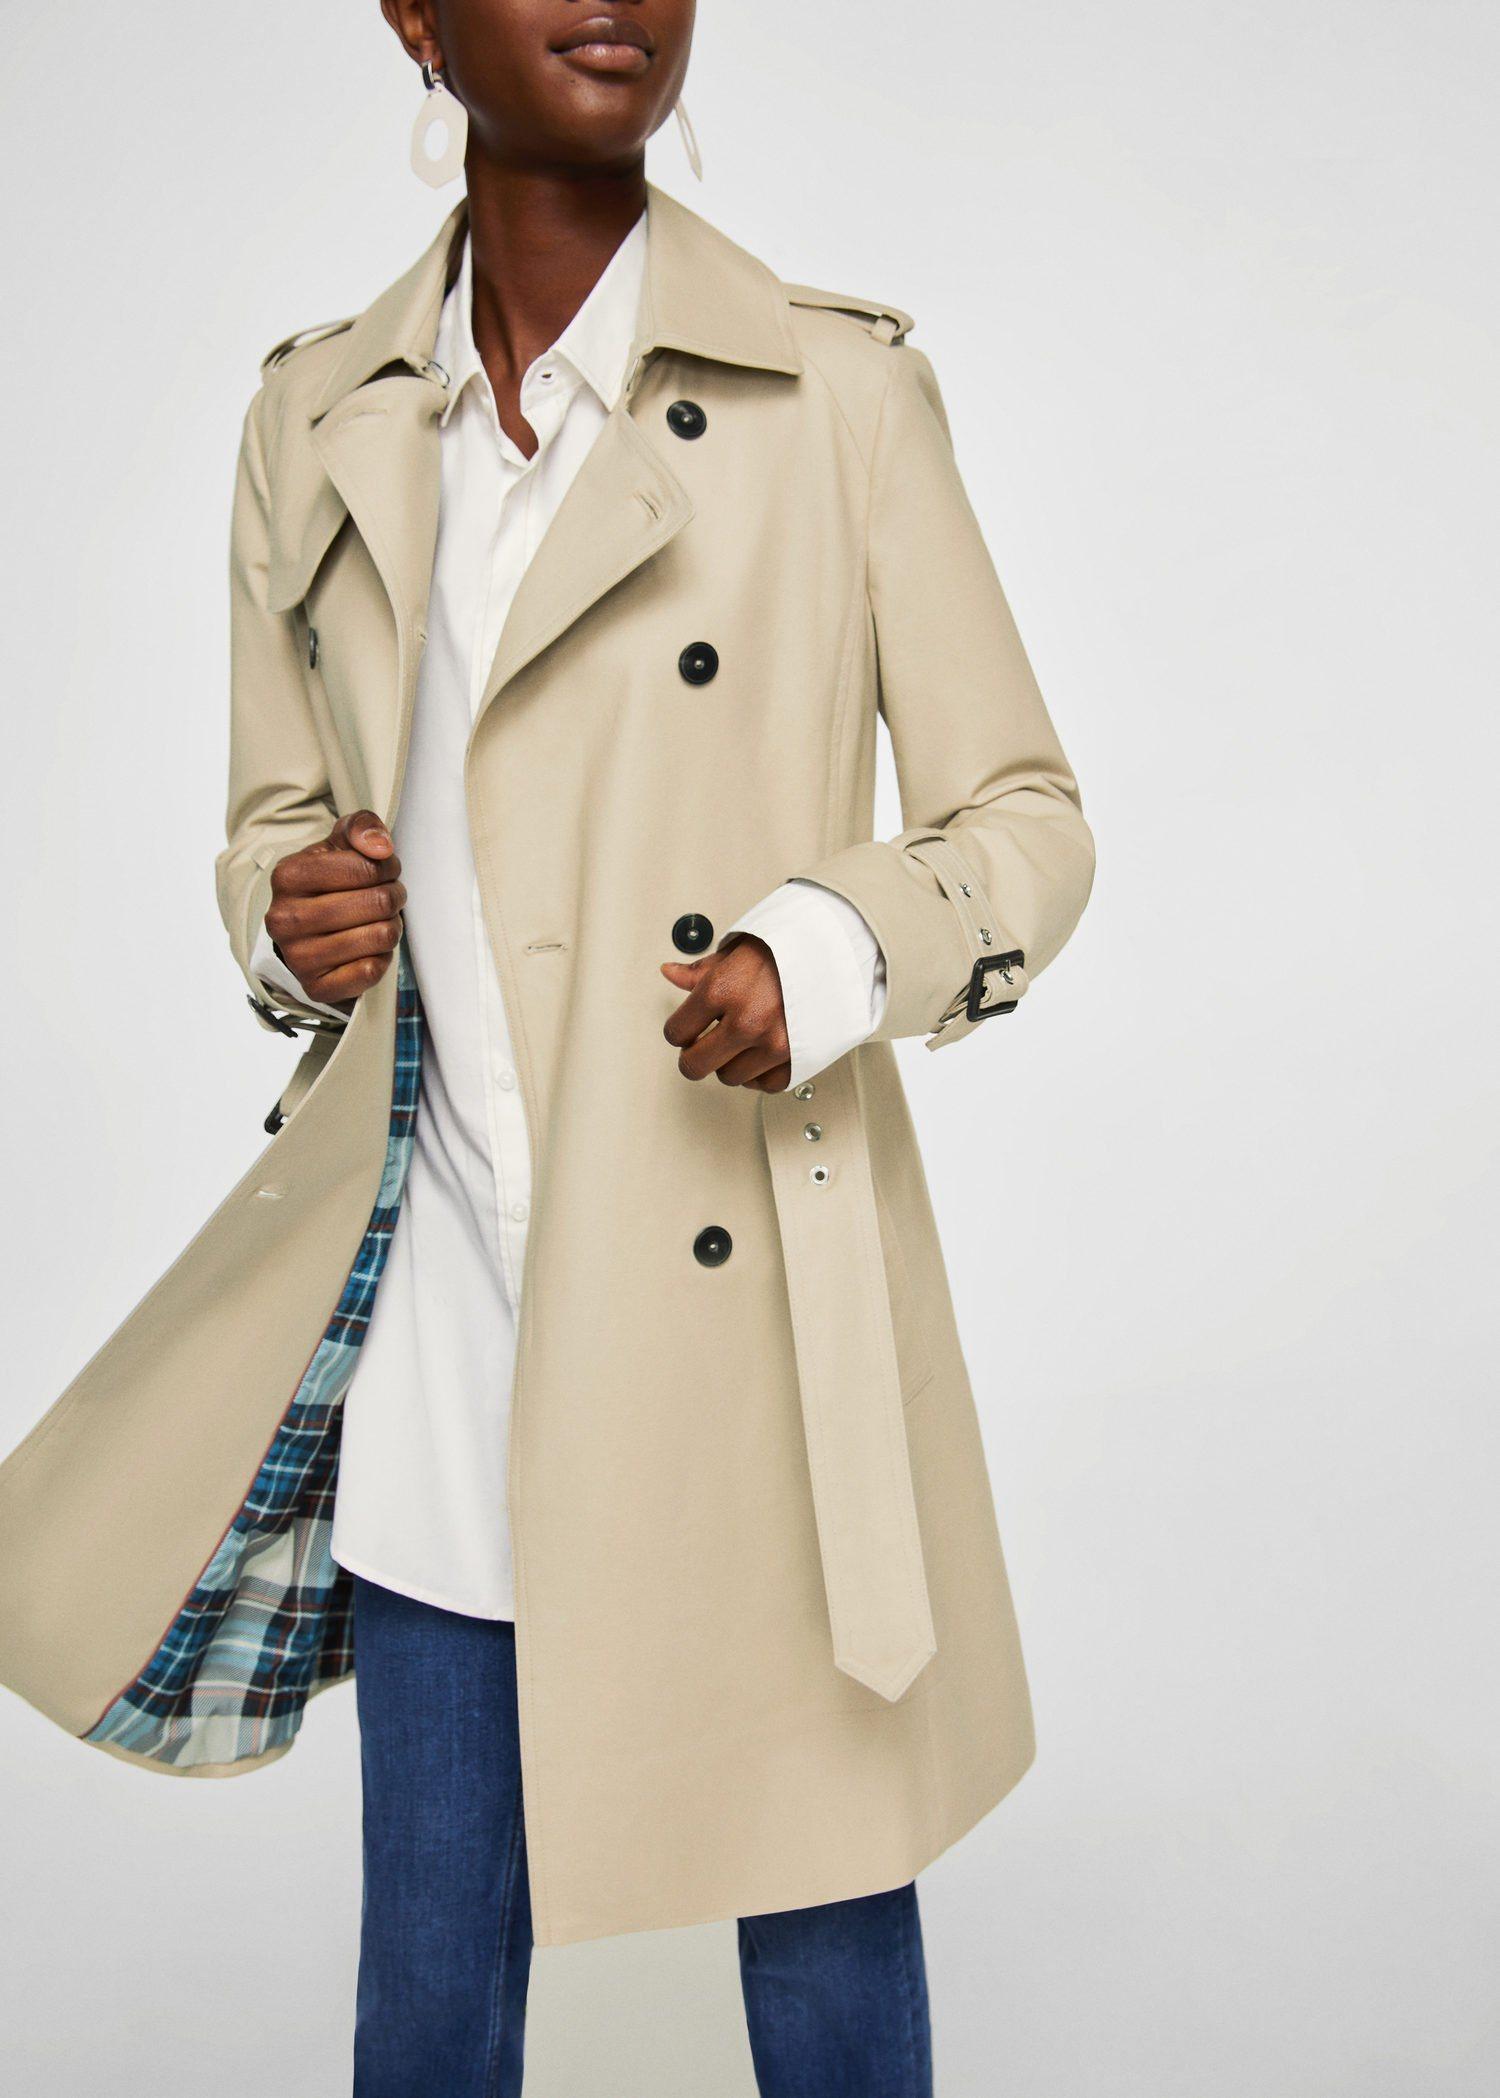 MANGO Zweireihiger Trenchcoat | Bekleidung > Mäntel > Trenchcoats | MANGO